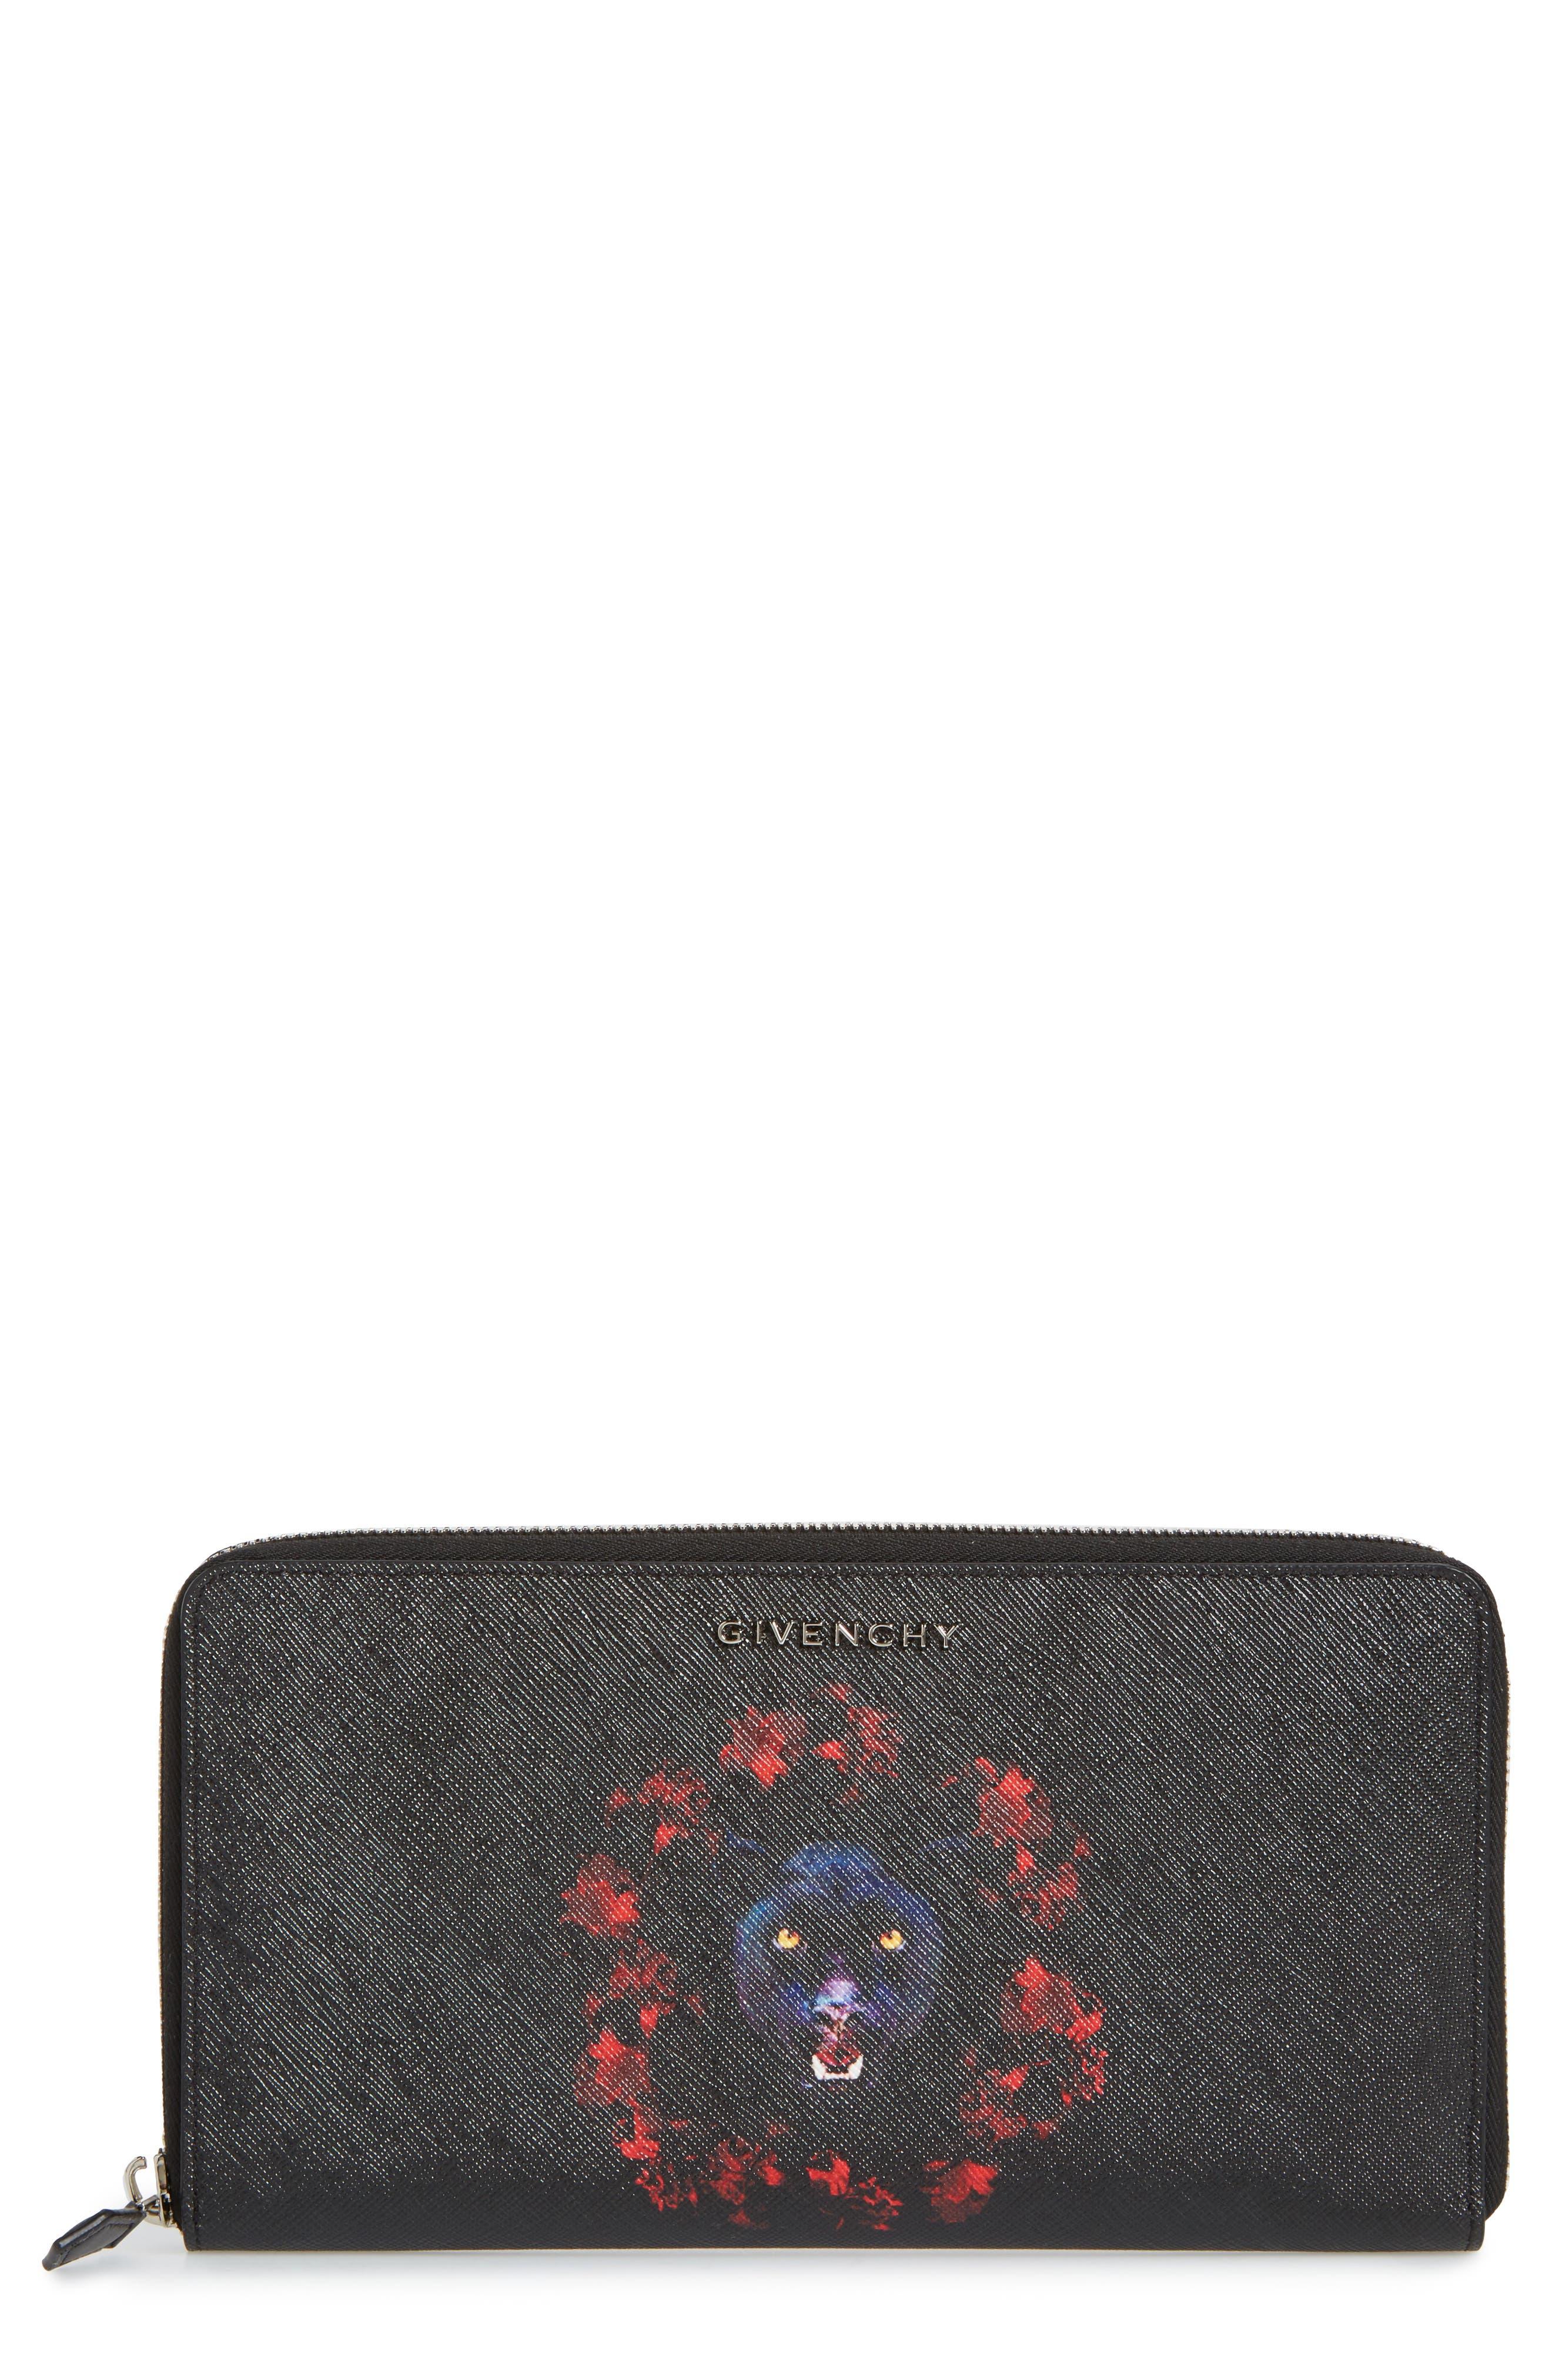 Givenchy Jaguar Zip-Around Wallet